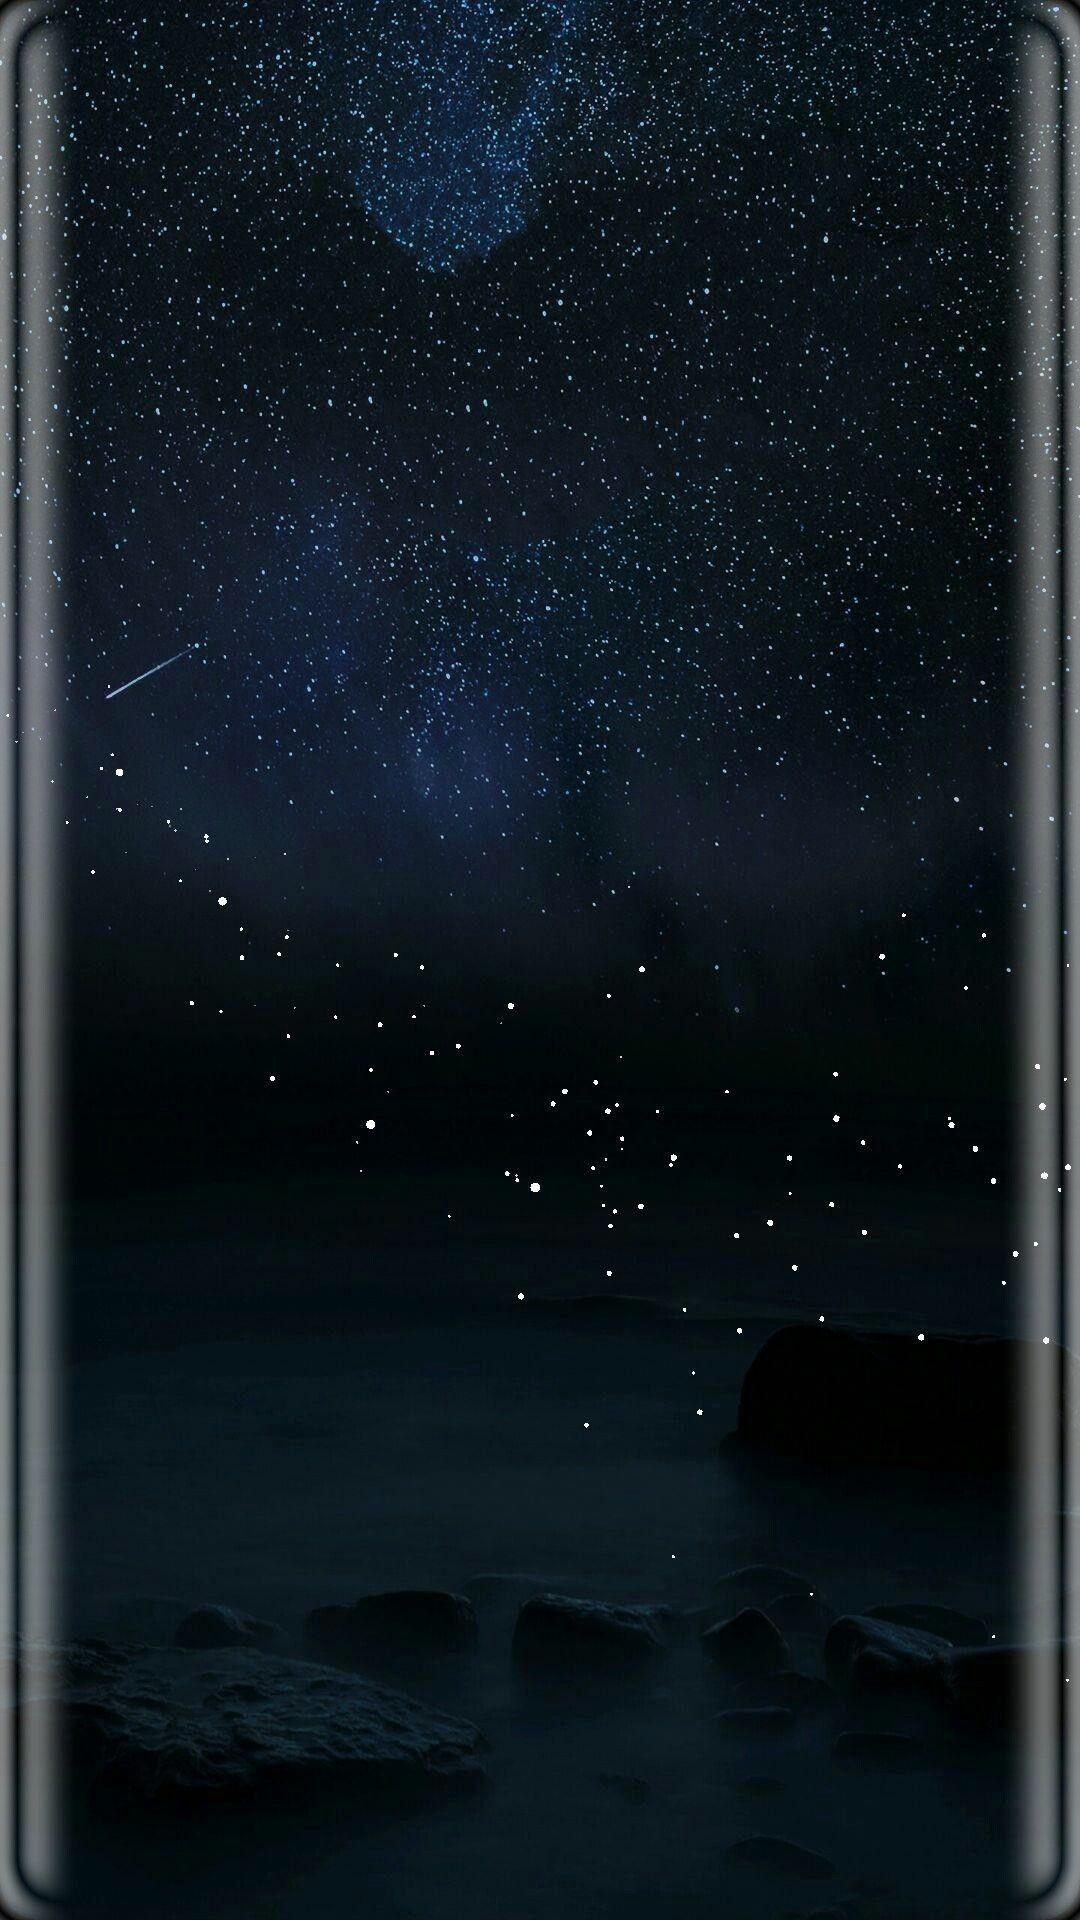 Samsung Galaxy S4 3d Live Wallpaper Galaxy Phone Wallpaper 73 Images